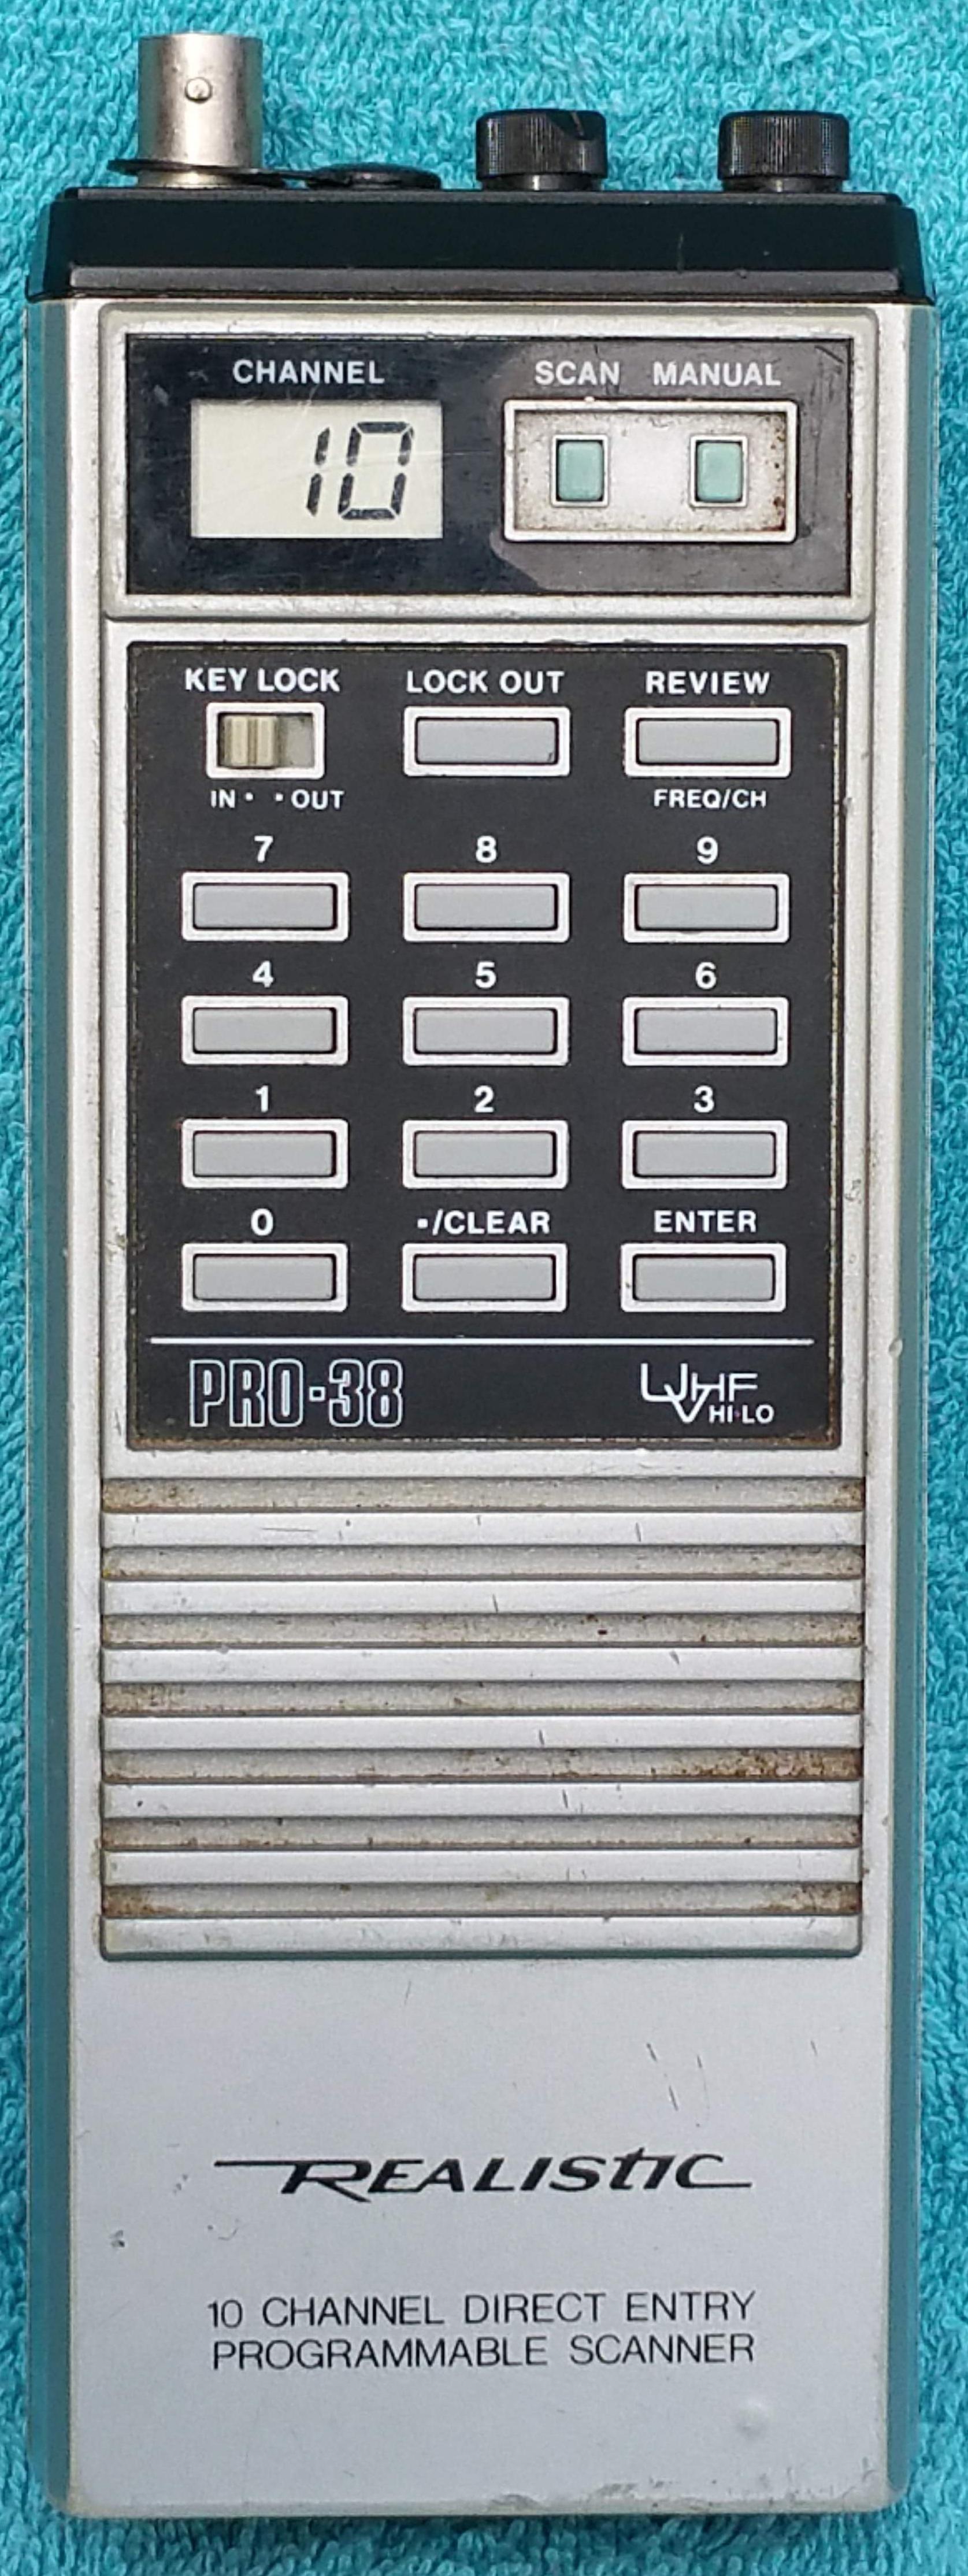 radiopics database radioshack  realistic pro 38  realistic pro-38 service manual